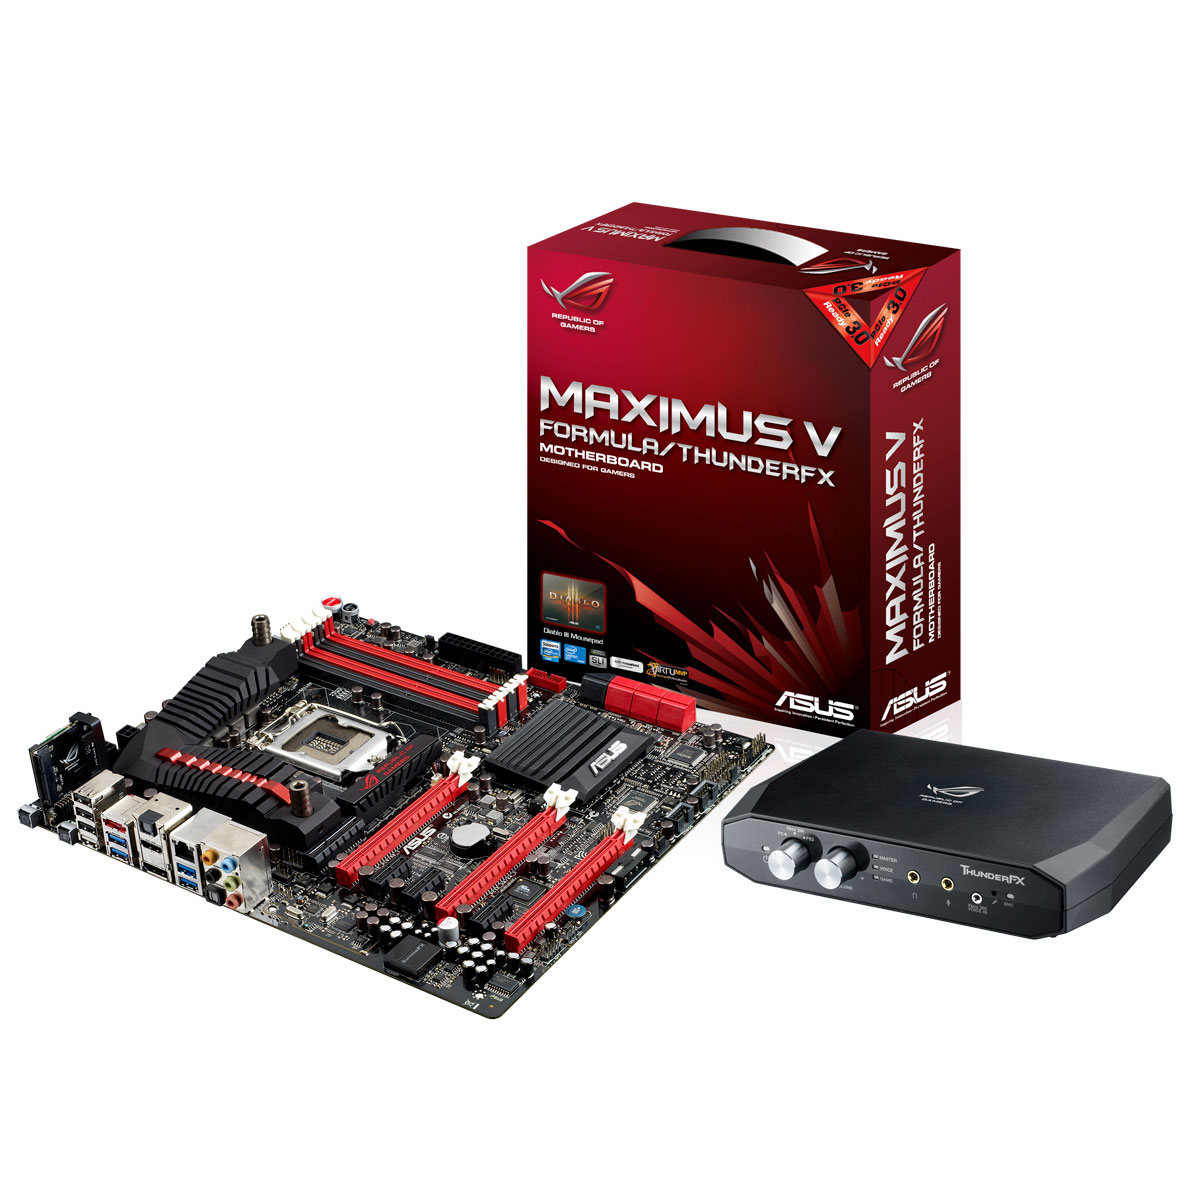 Carte mère ASUS Maximus V Formula/ThunderFX Carte mère E-ATX Socket 1155 Intel Z77 Express - SATA 6Gb/s - USB 3.0 - 3x PCI-Express 3.0 16x